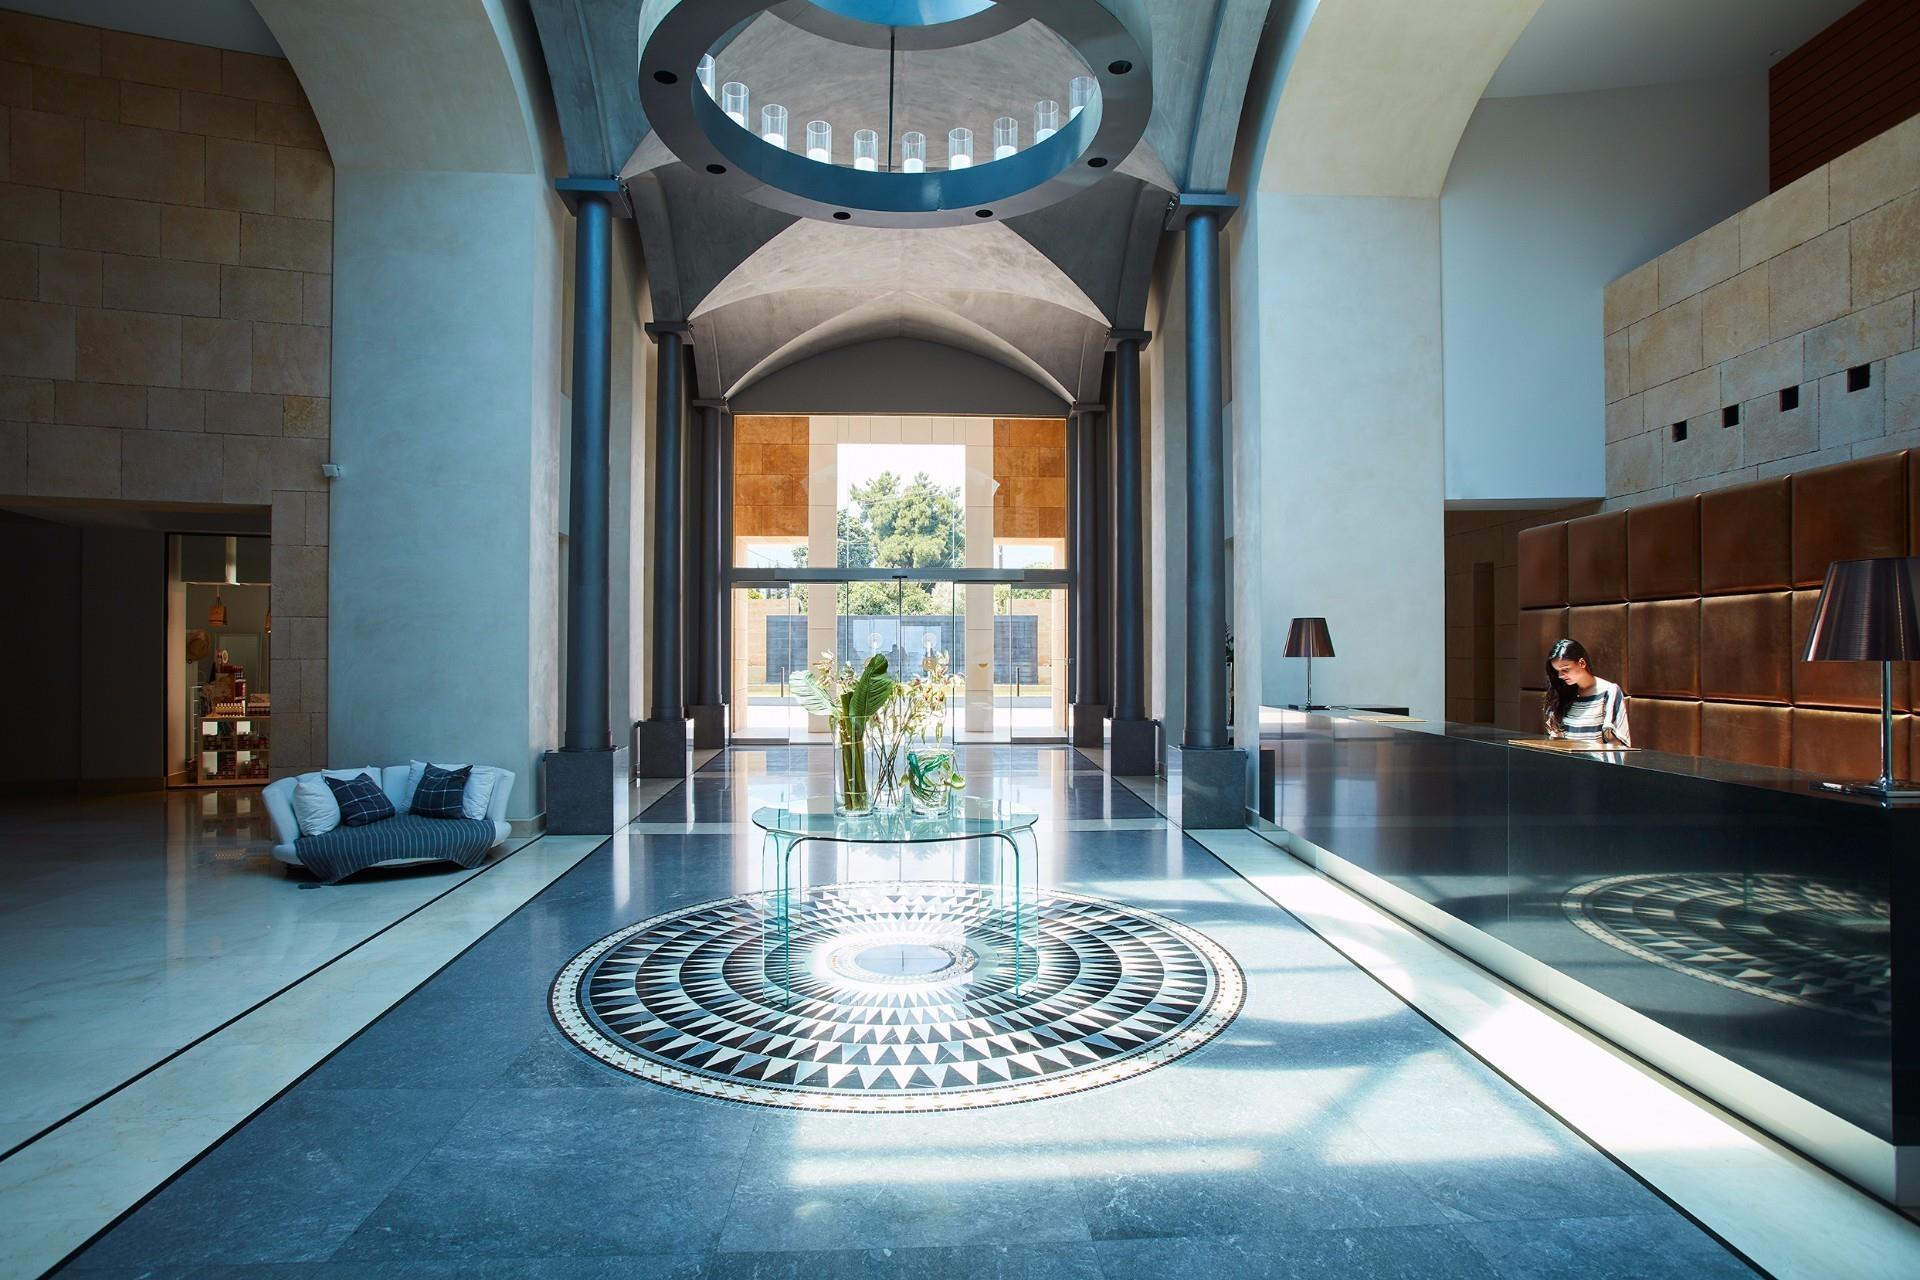 cavo-olympo-luxury-hotel-spa-genel-006